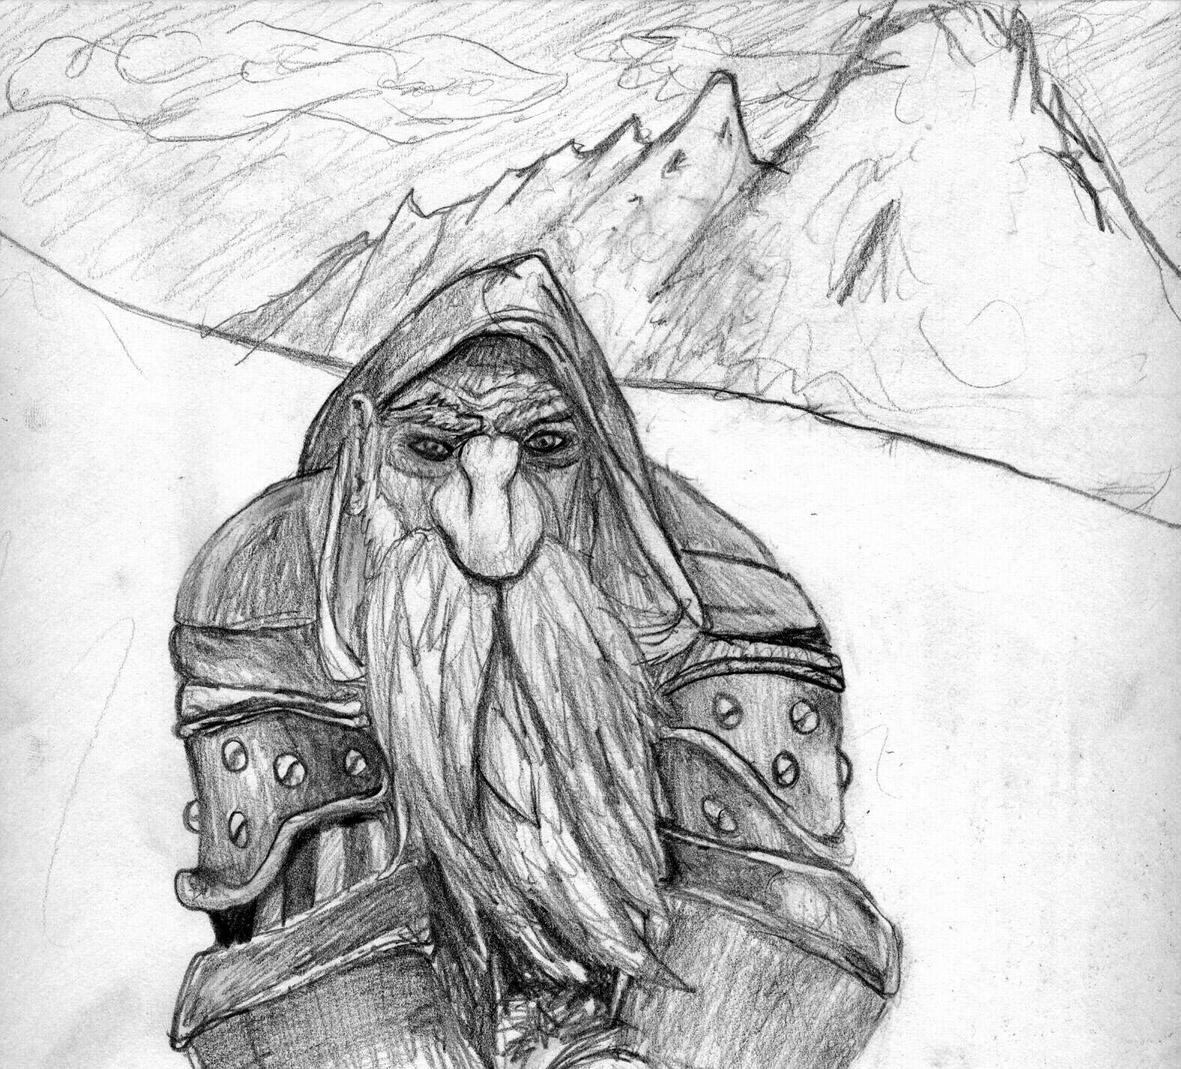 dwarf by draw answer dwarf by draw answer